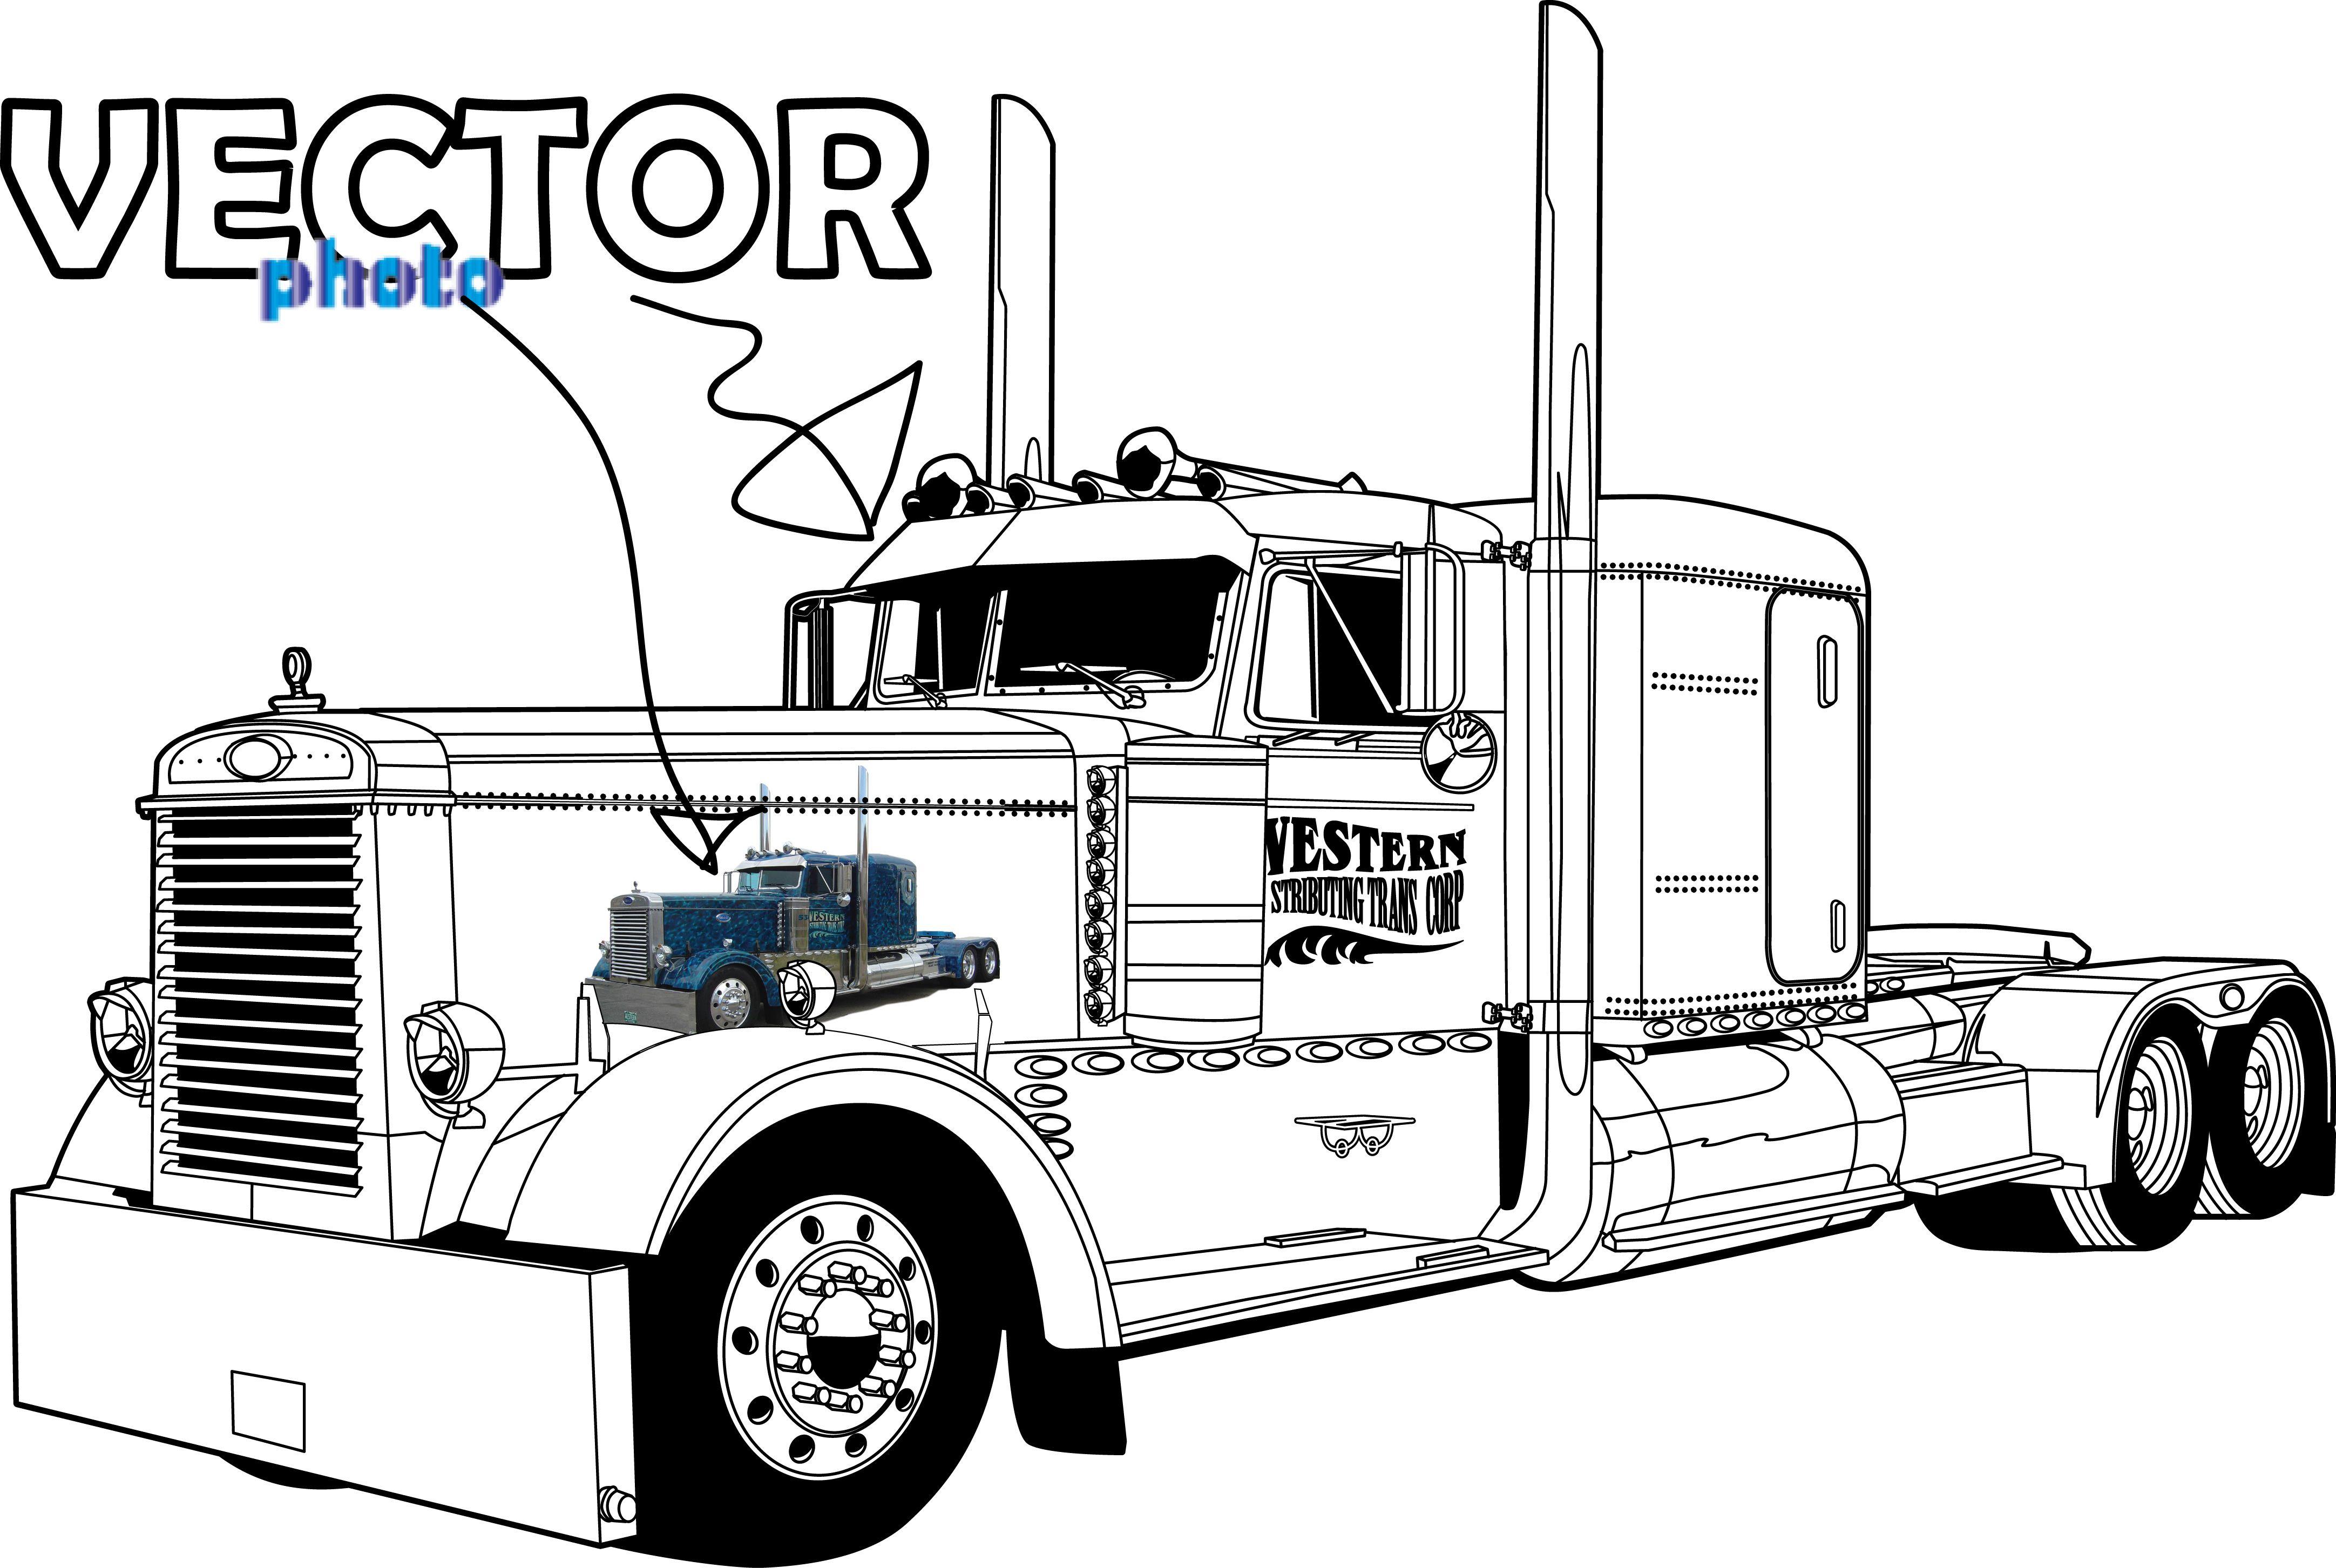 Truck Battery Wiring Diagram On Peterbilt Trucks Wiring Diagrams For